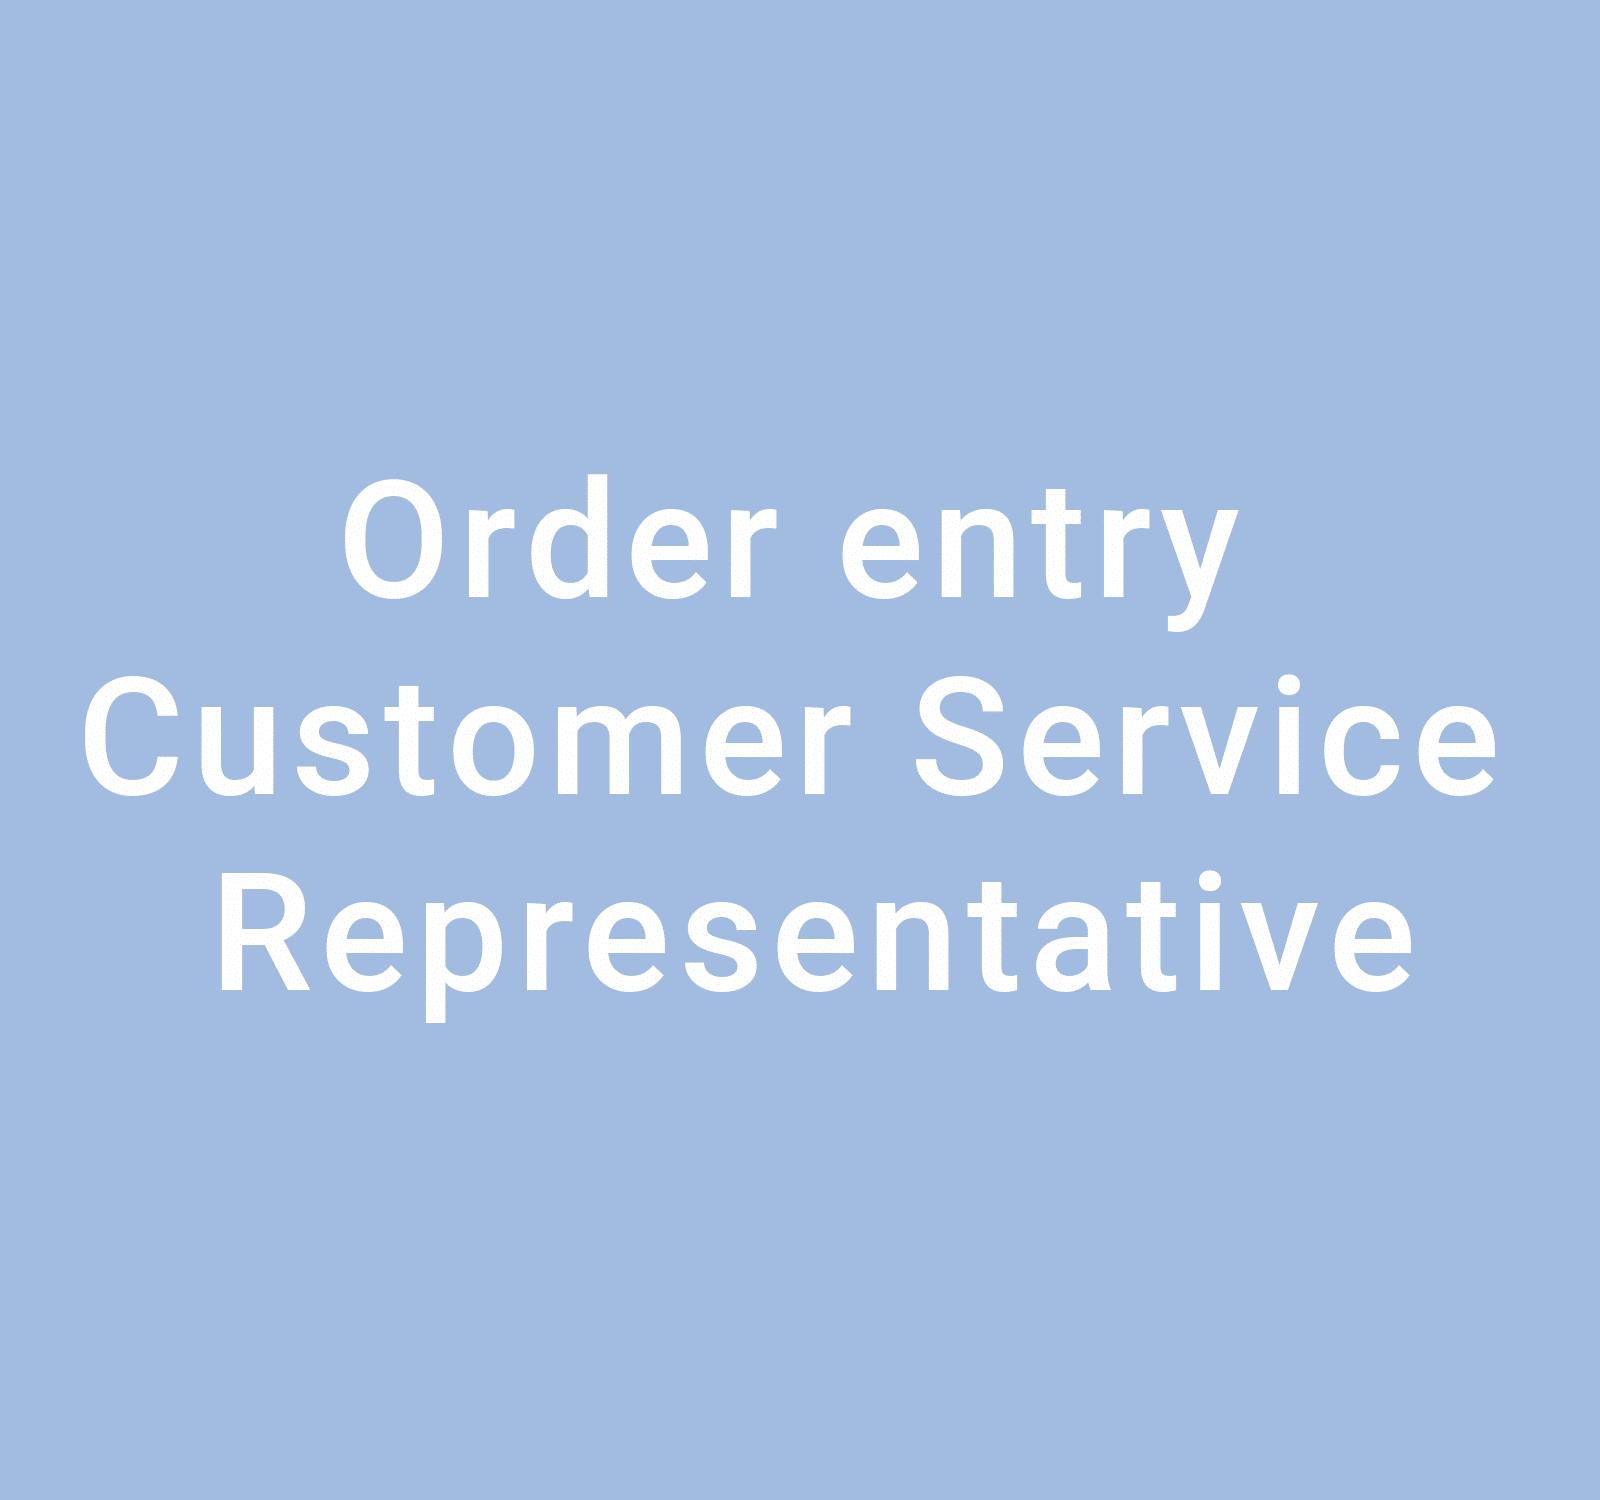 Order entry / Customer Service Representative